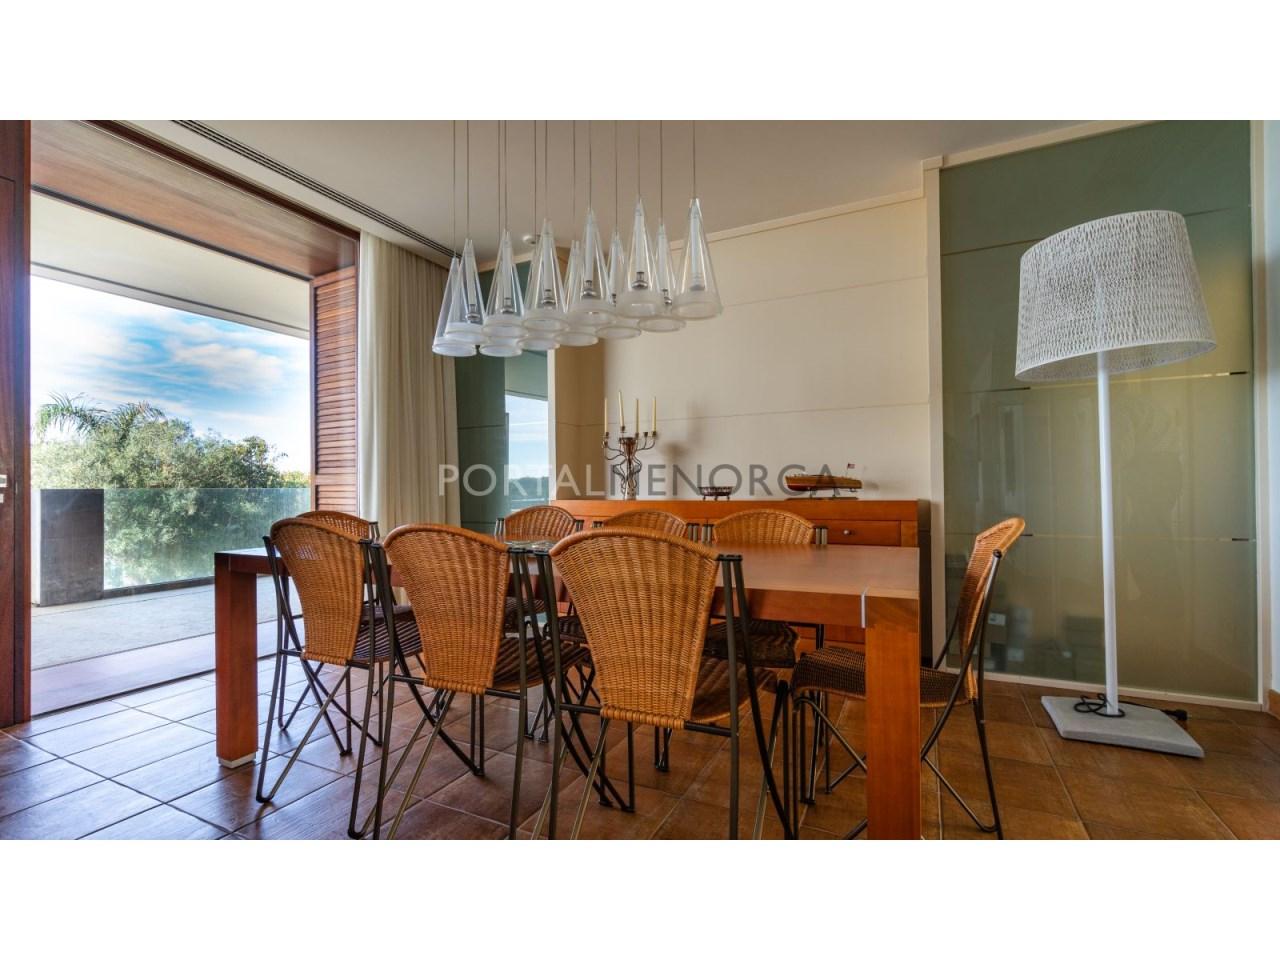 luxe-maison-vendre-acheter-menorca (3)